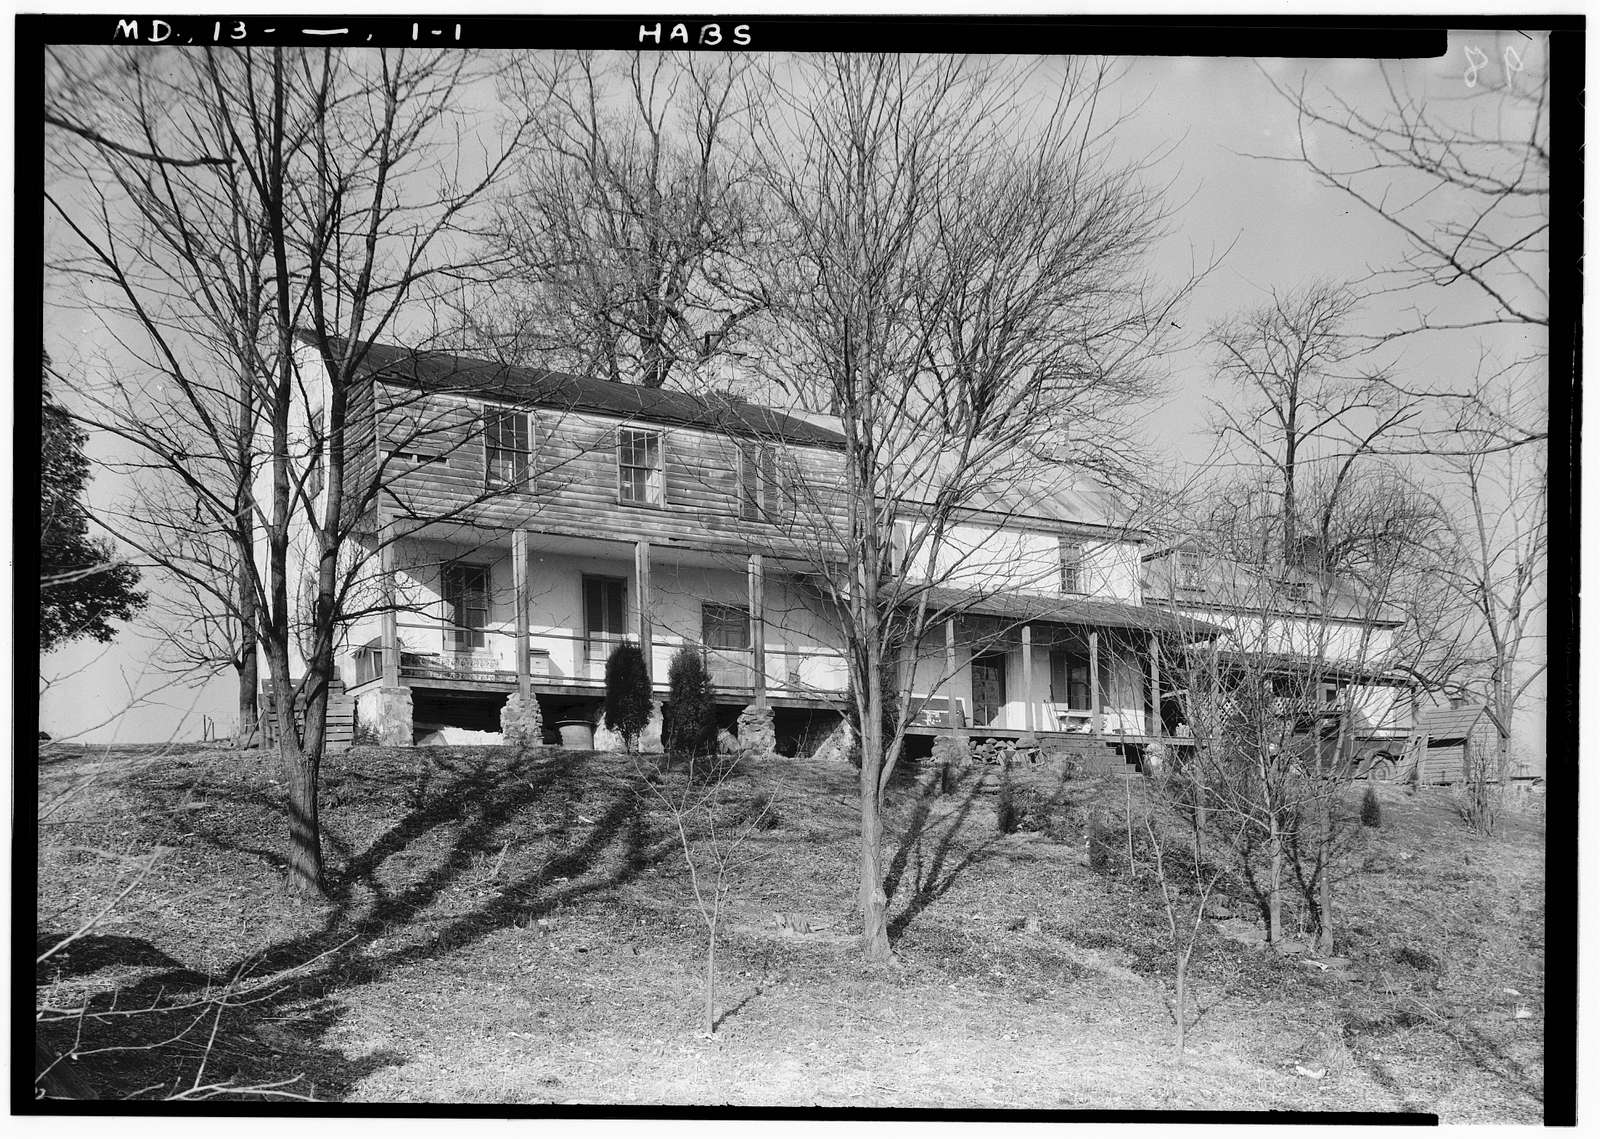 Mountain Road (Farmhouse), Stockton, Harford County, MD